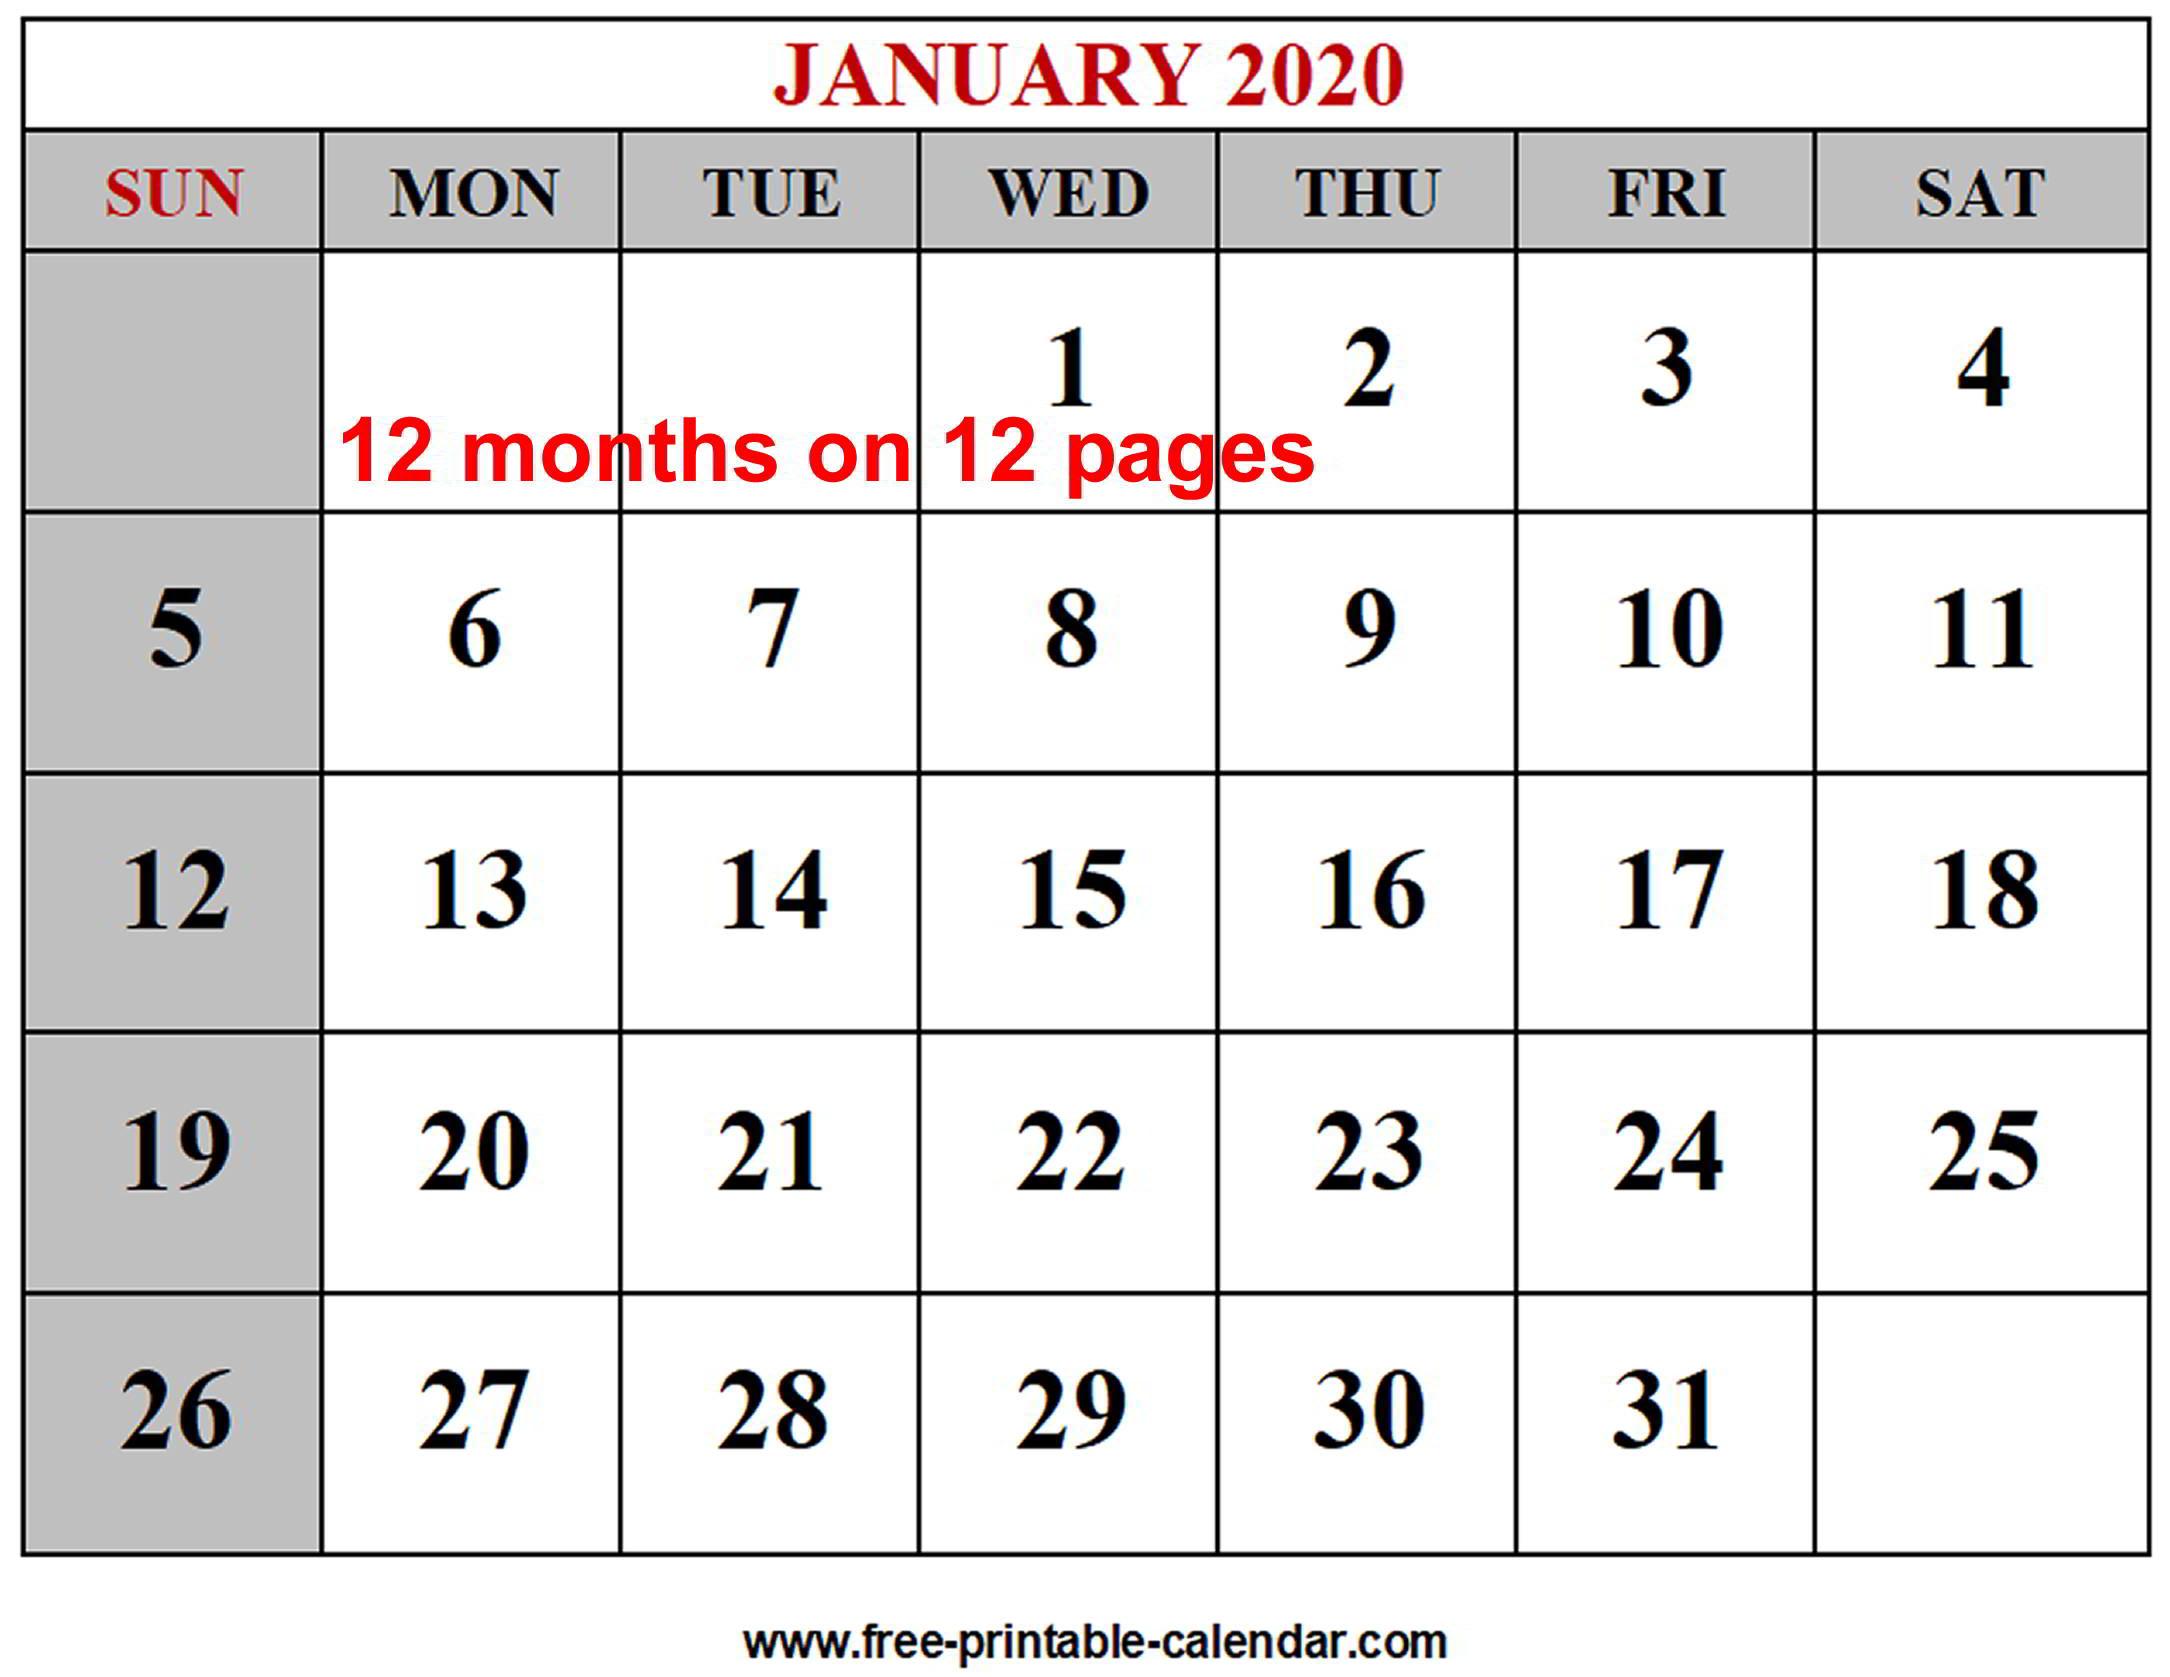 Year 2020 Calendar Templates - Free-Printable-Calendar within Free Blank Printable Monthly Calendar 2020